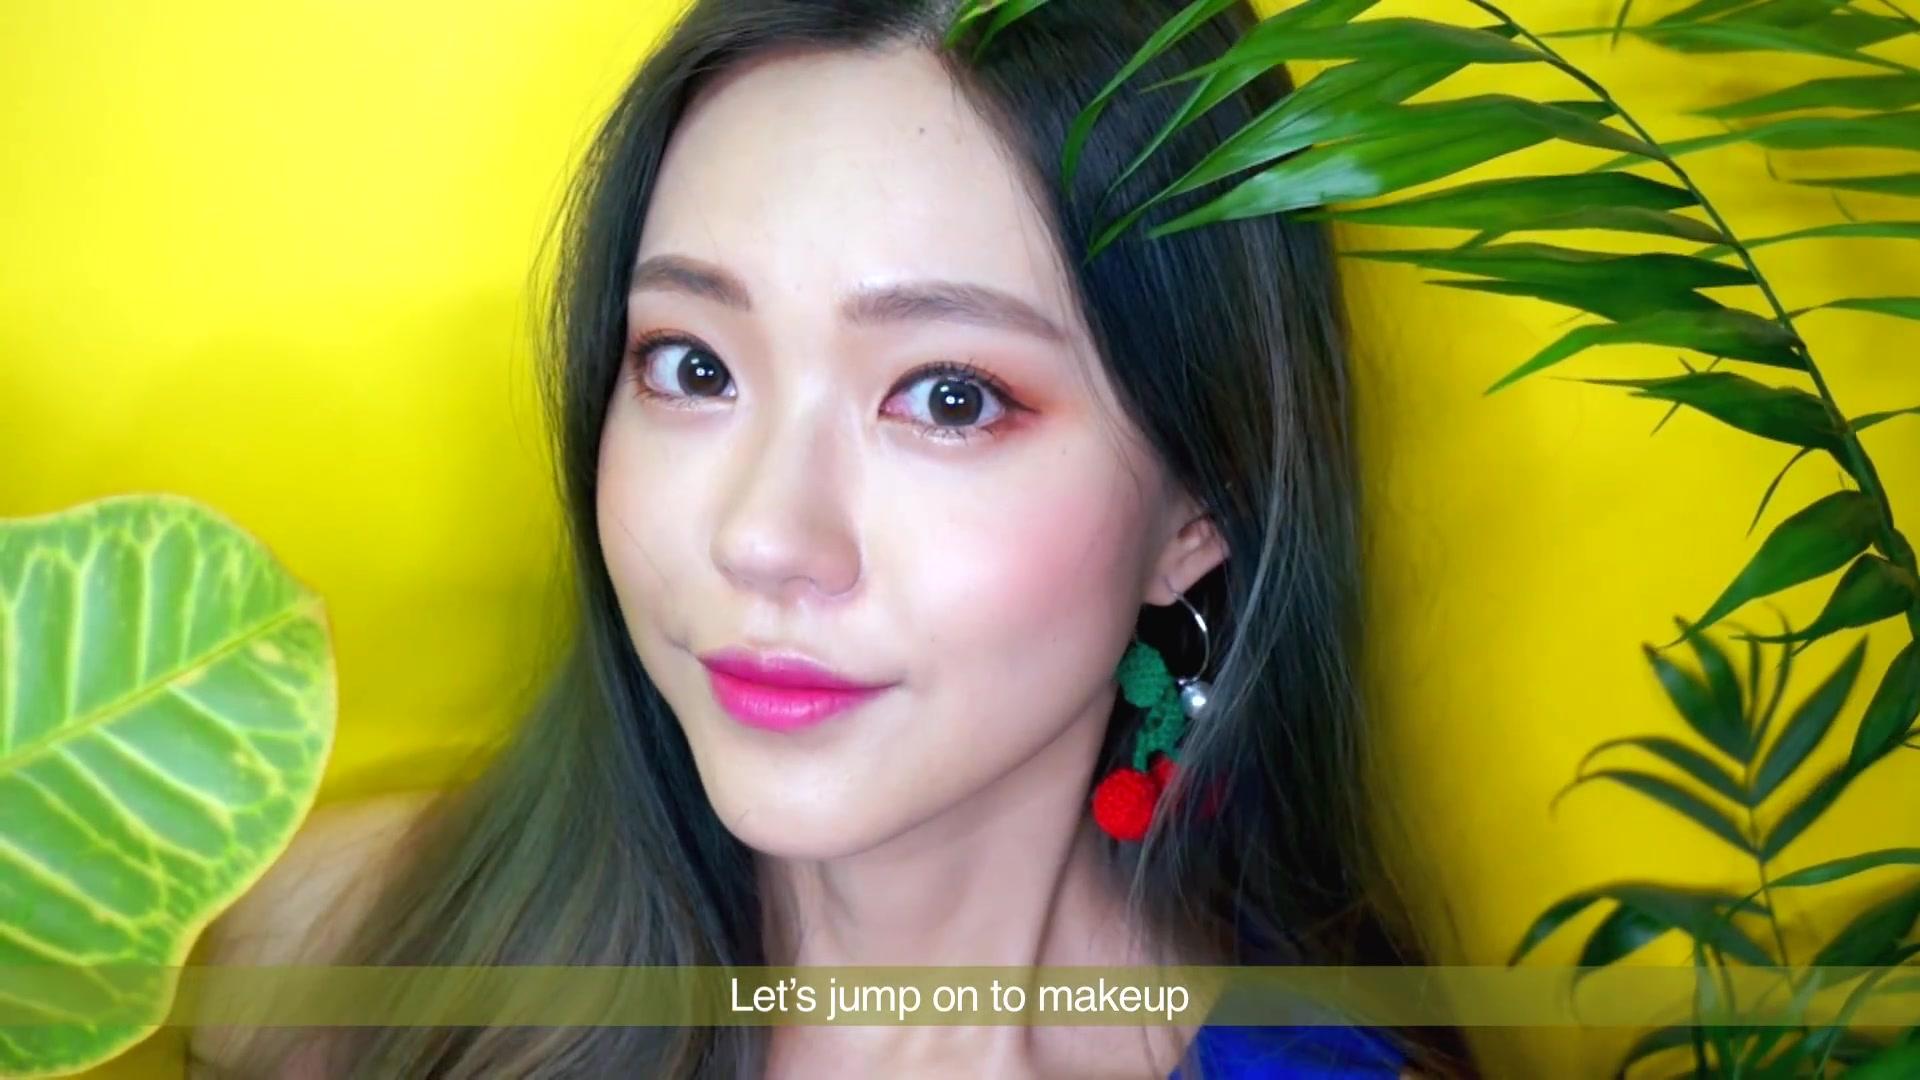 DIA TV Original: Heizle Episode 44: Red Velvet's Irene Cover Red Flavor Makeup